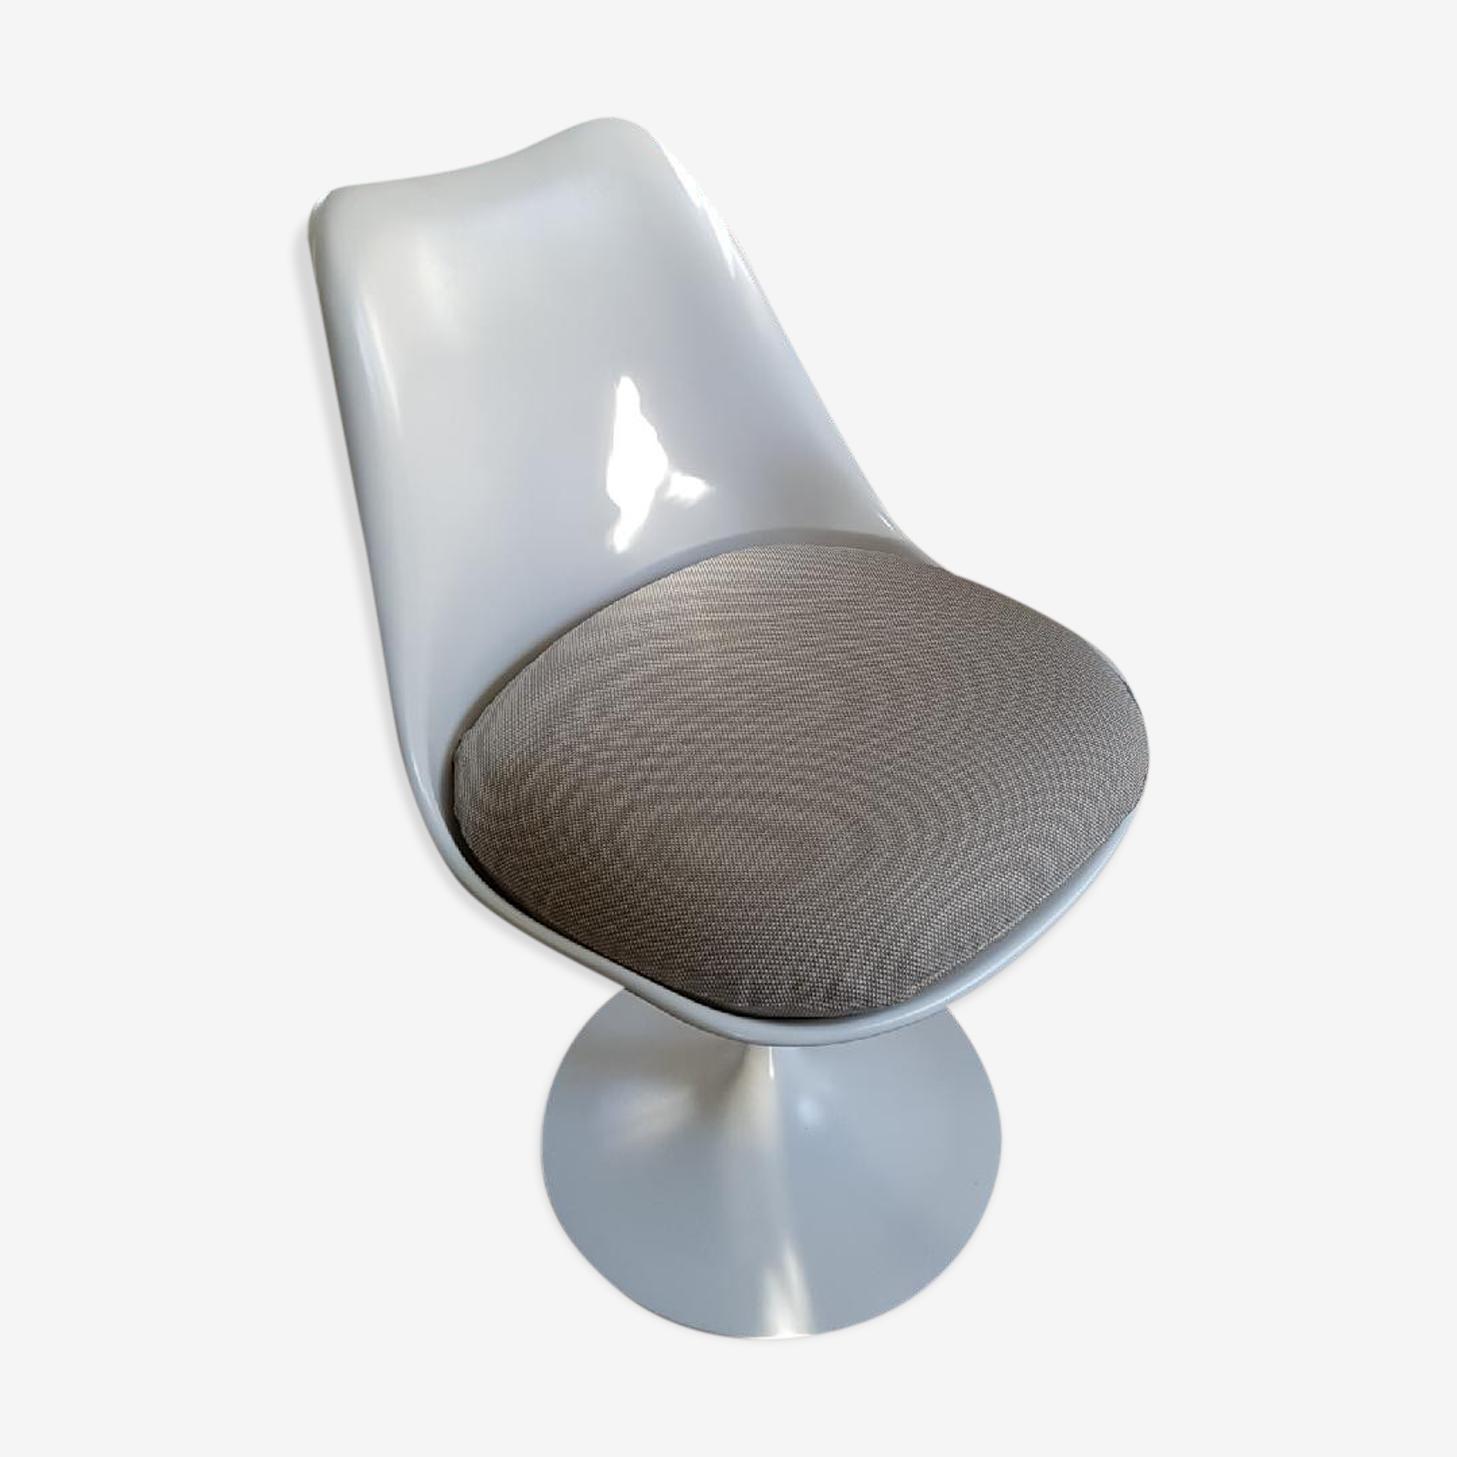 Chair Eero Saarinen for Knoll Tulip